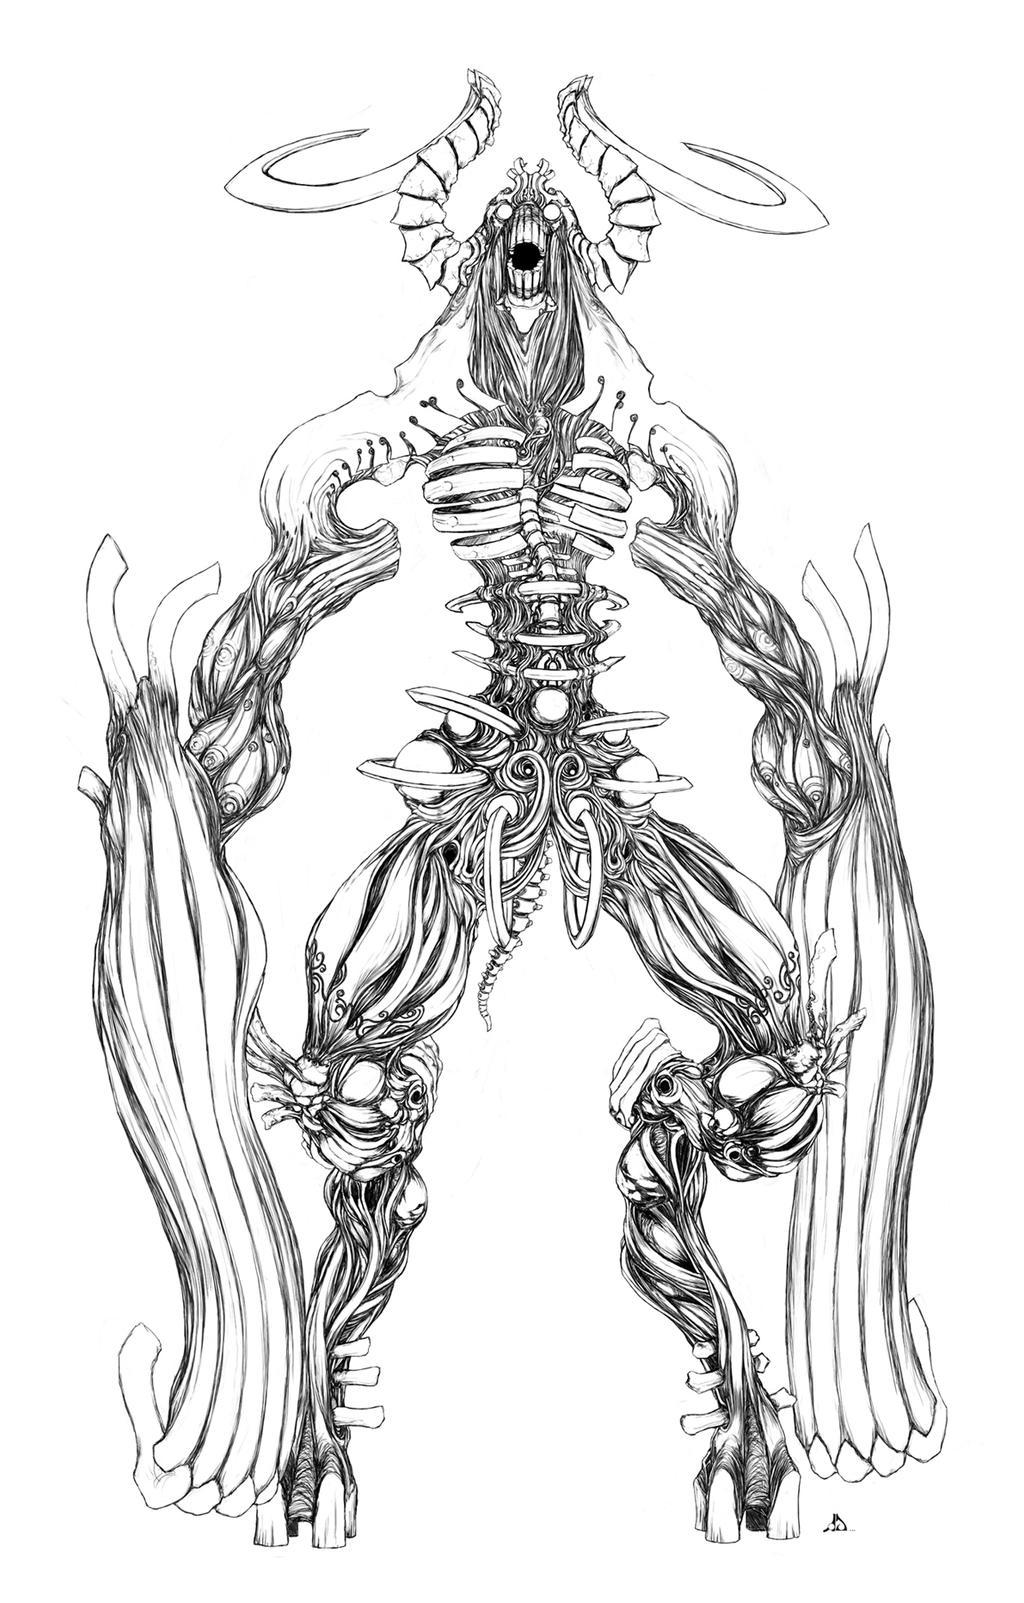 Line Art Painting : Colossal beast line art by conceptualmachina on deviantart